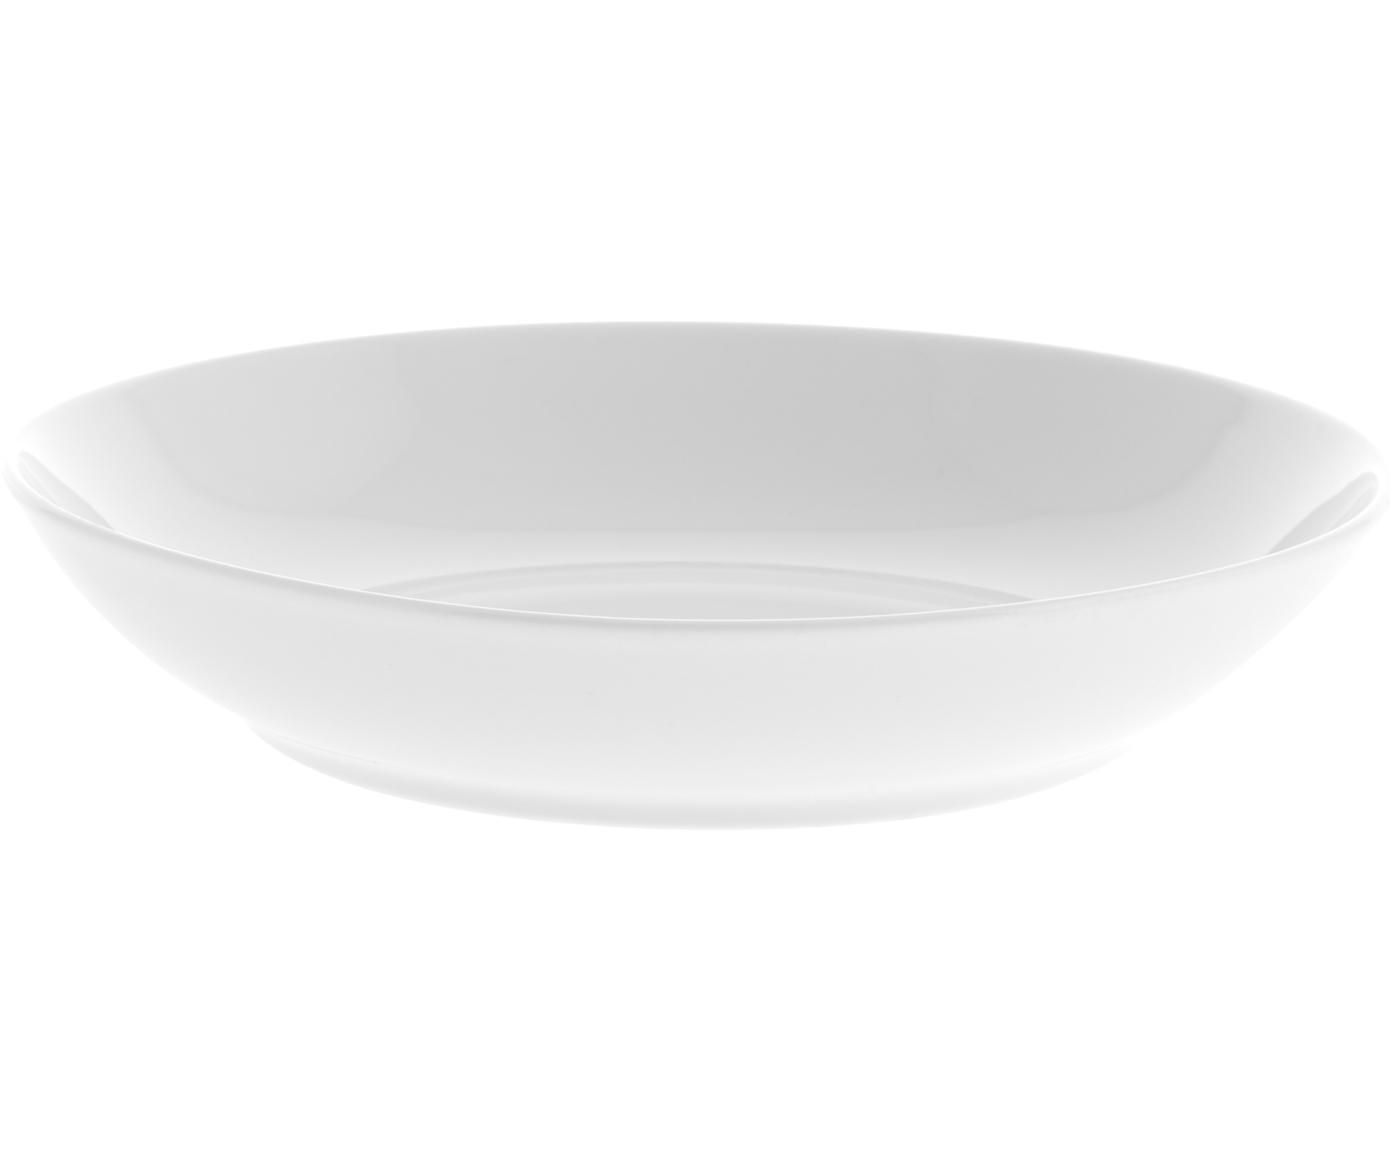 Platos hondos Delight Modern, 2uds., Porcelana, Blanco, Ø 21 x Al 4 cm